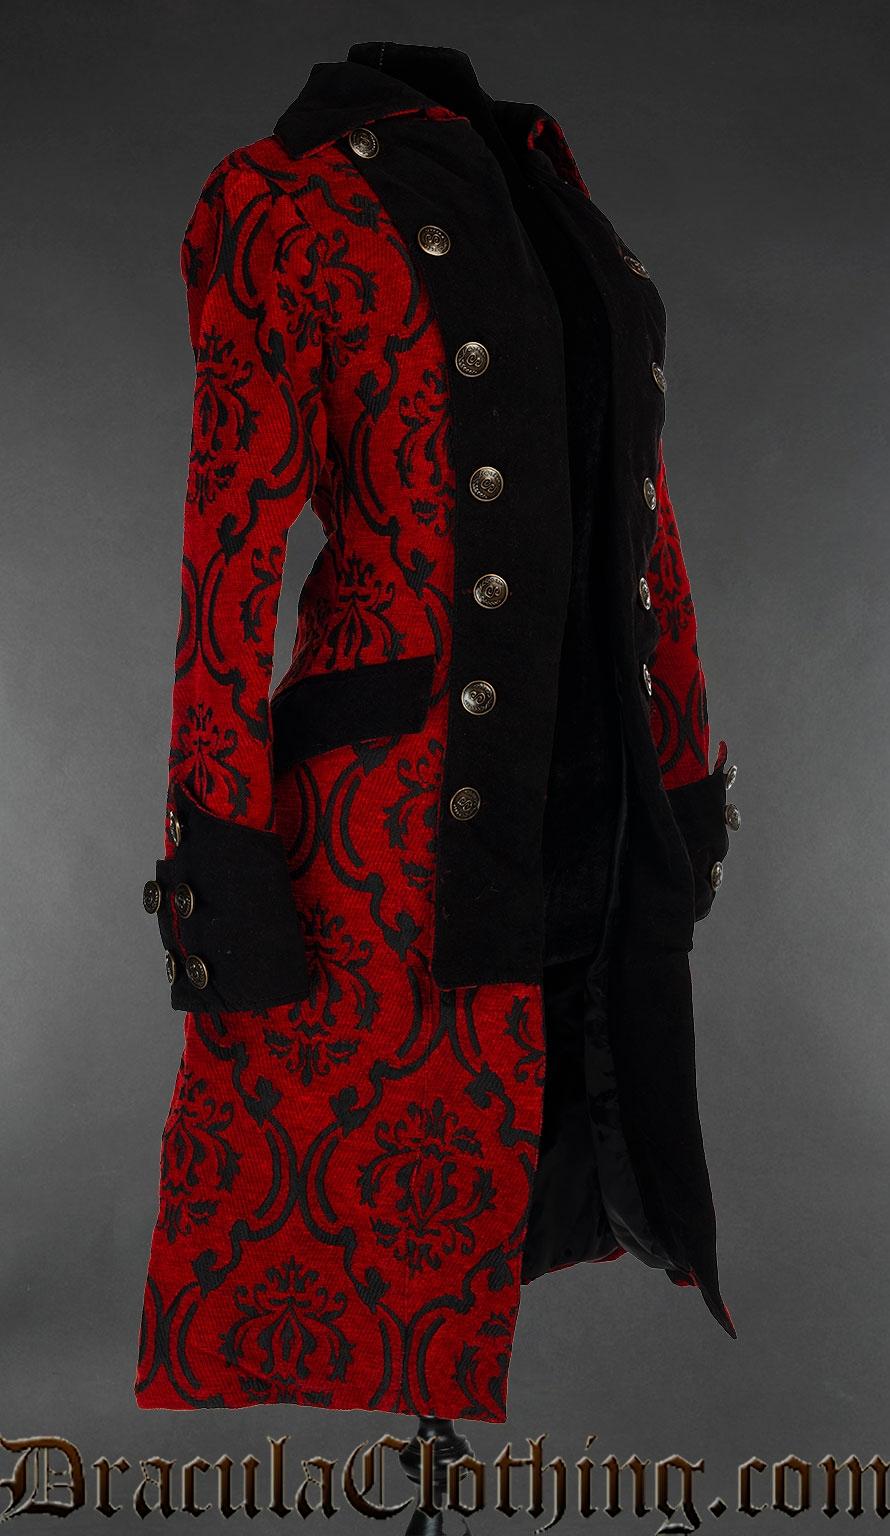 Crimson Pirate Princess Coat